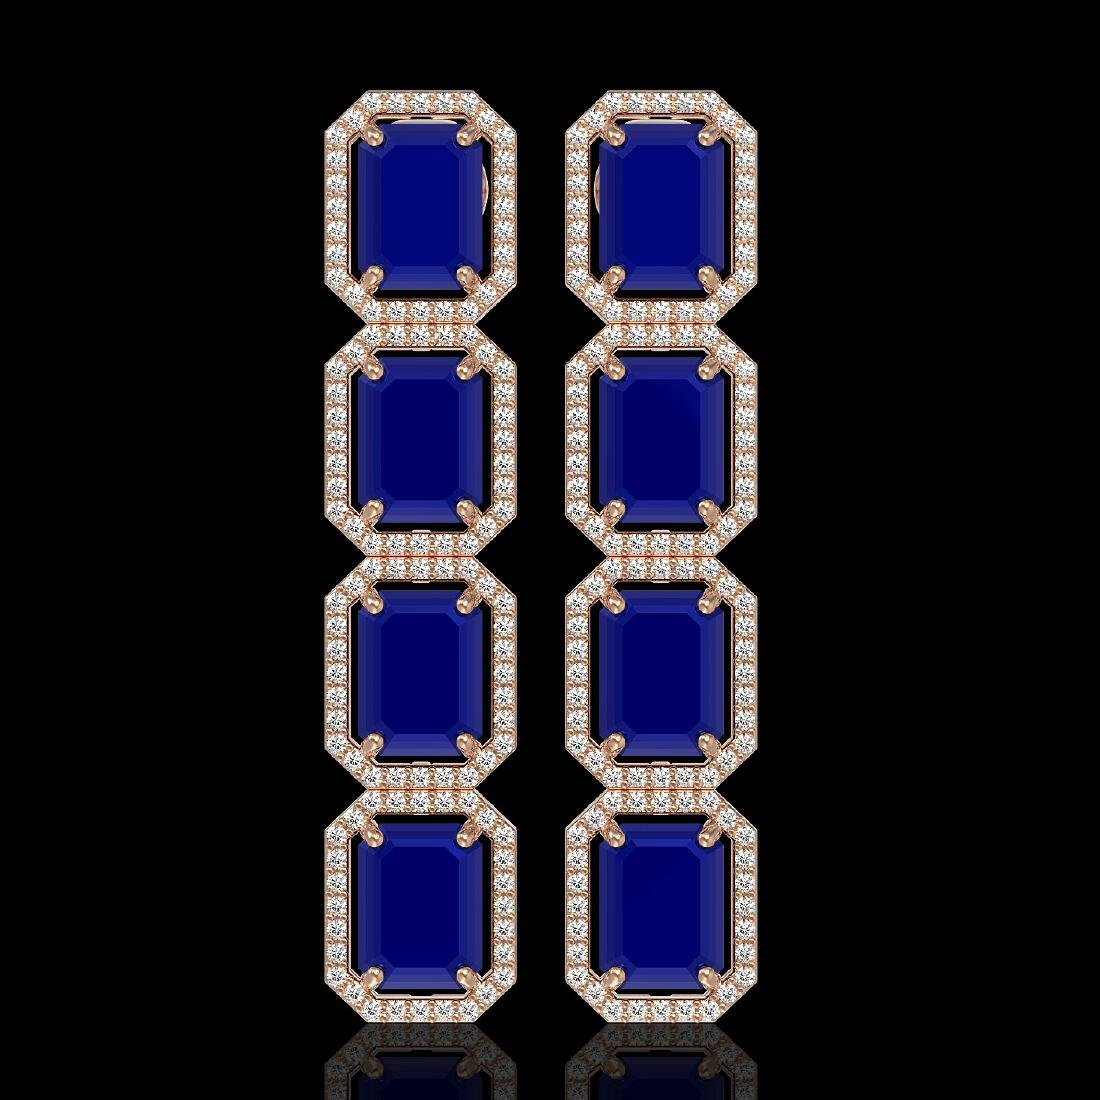 20.59 CTW Sapphire & Diamond Halo Earrings 10K Rose